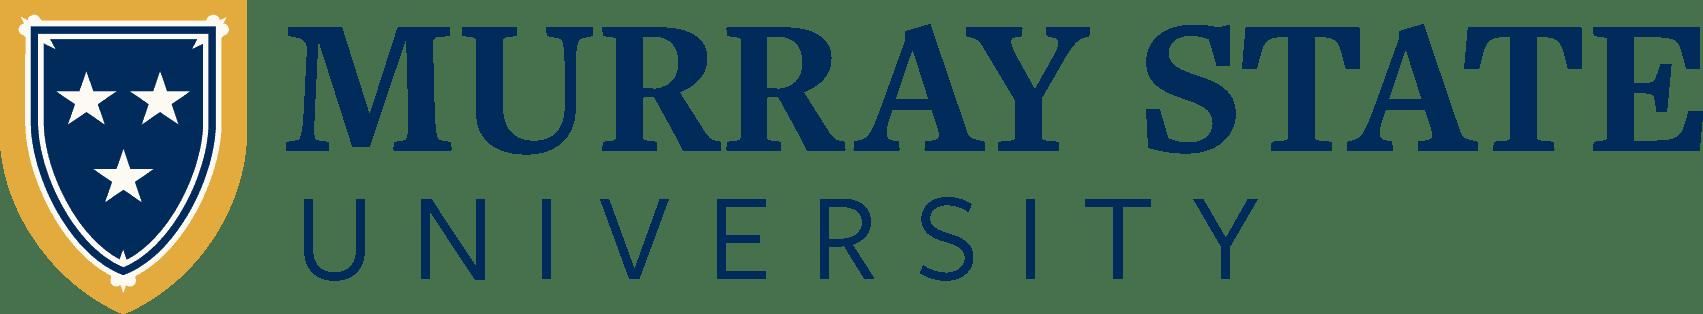 regional academic outreach murray state university logo 130023